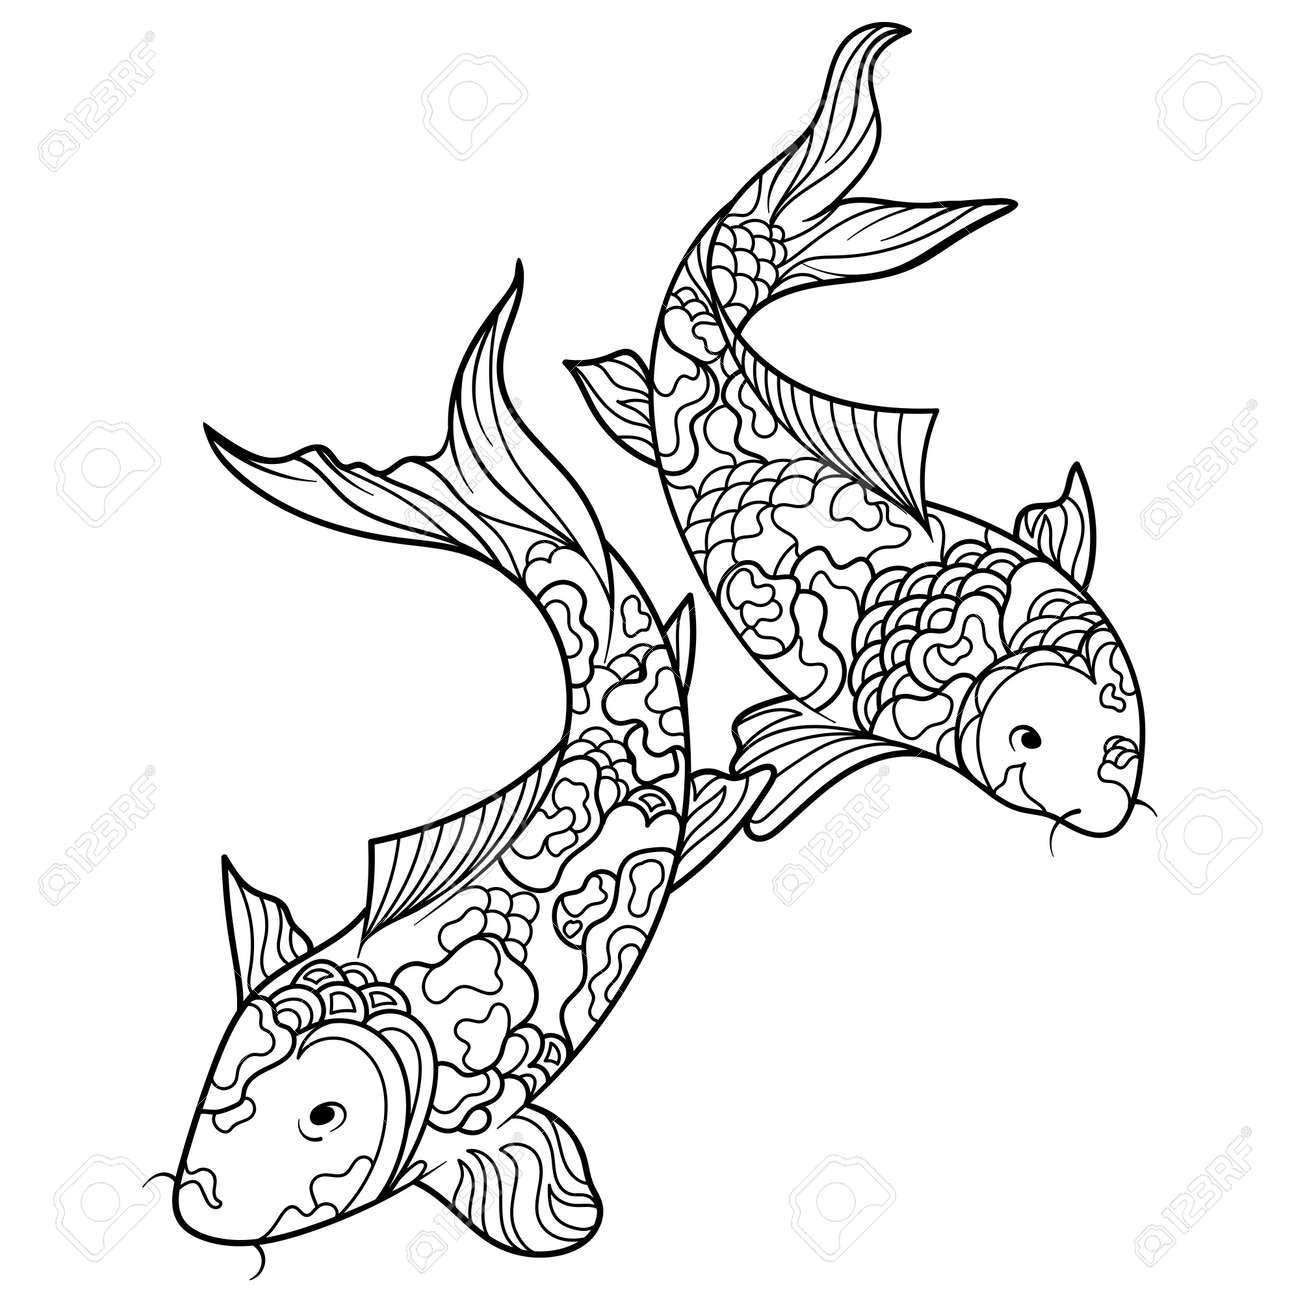 Koi Carp Fish Coloring Book For Adults Illustration. Anti-stress ...